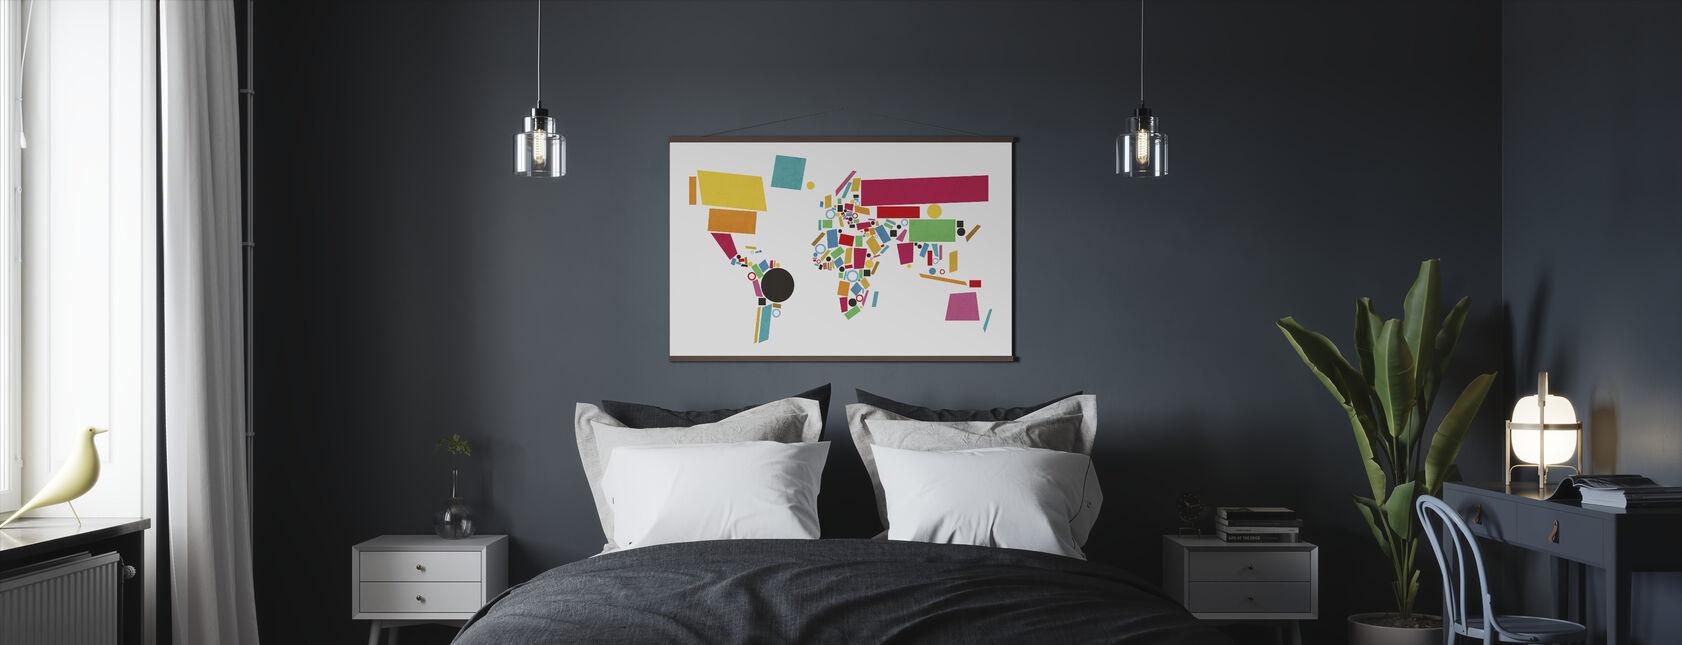 Multicoloured canvas prints